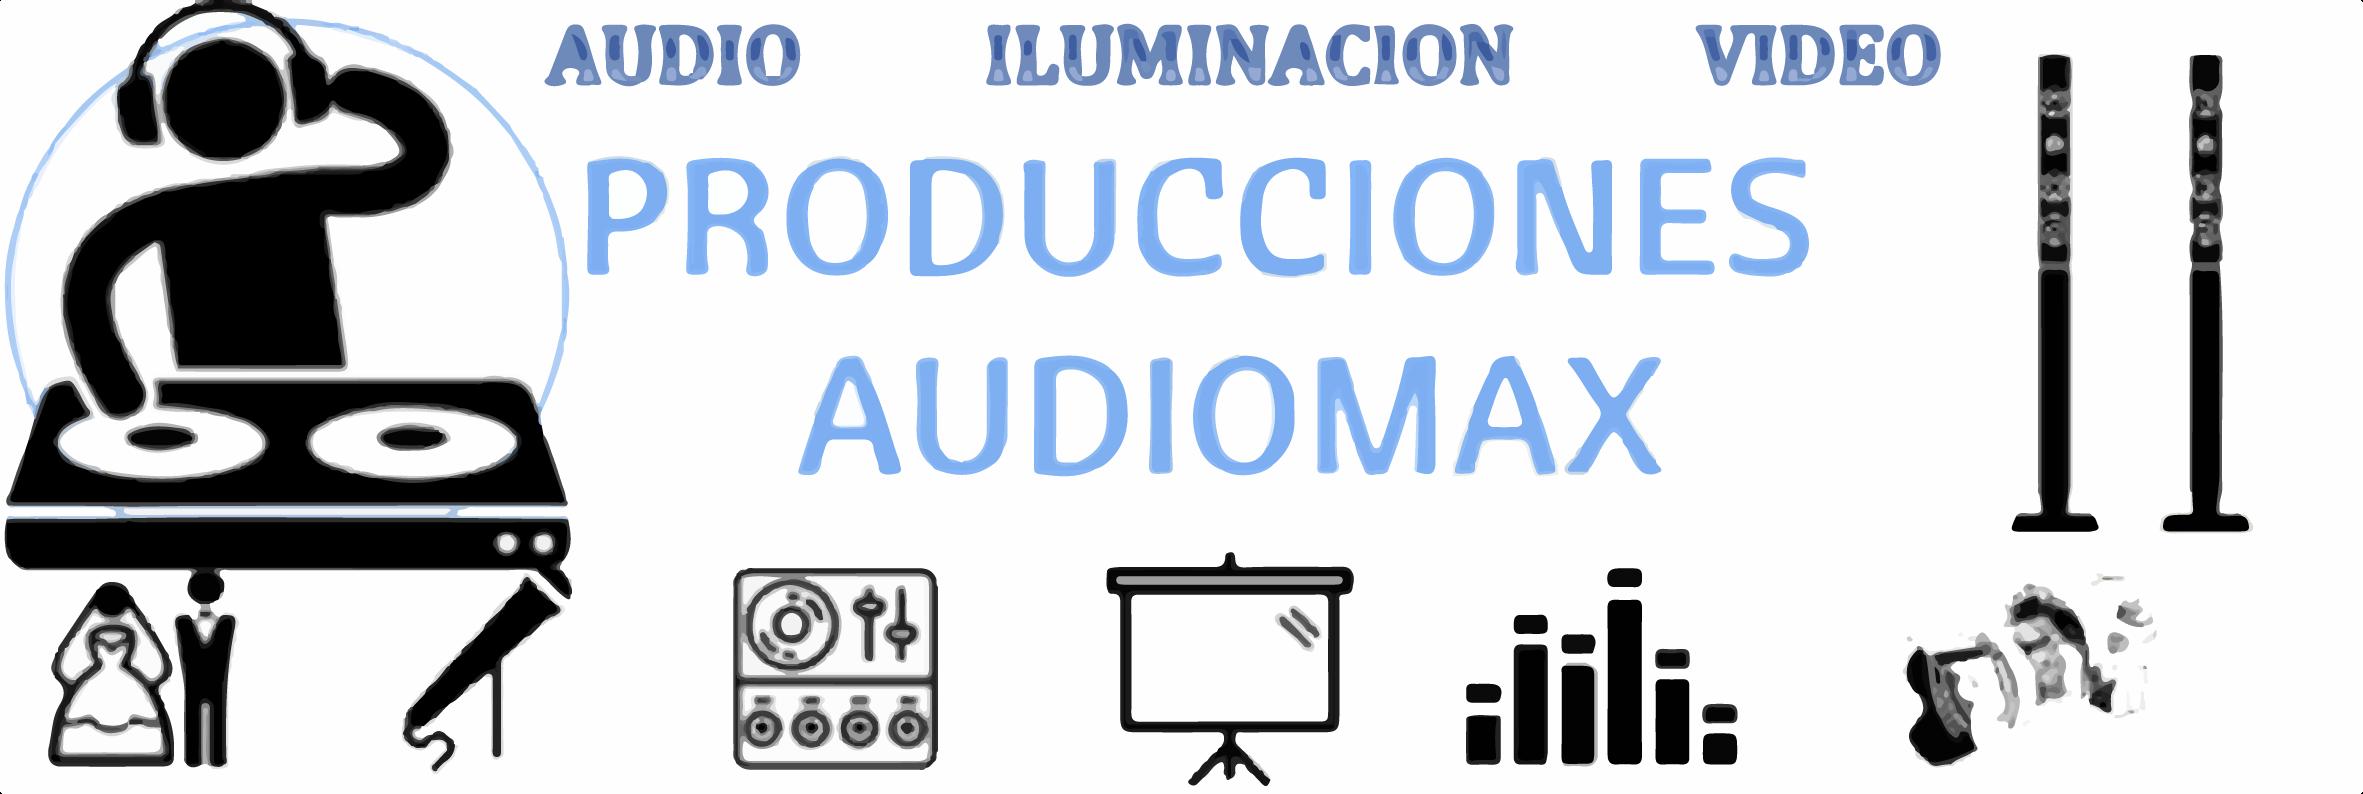 PRODUCCIONESAUDIOMAX